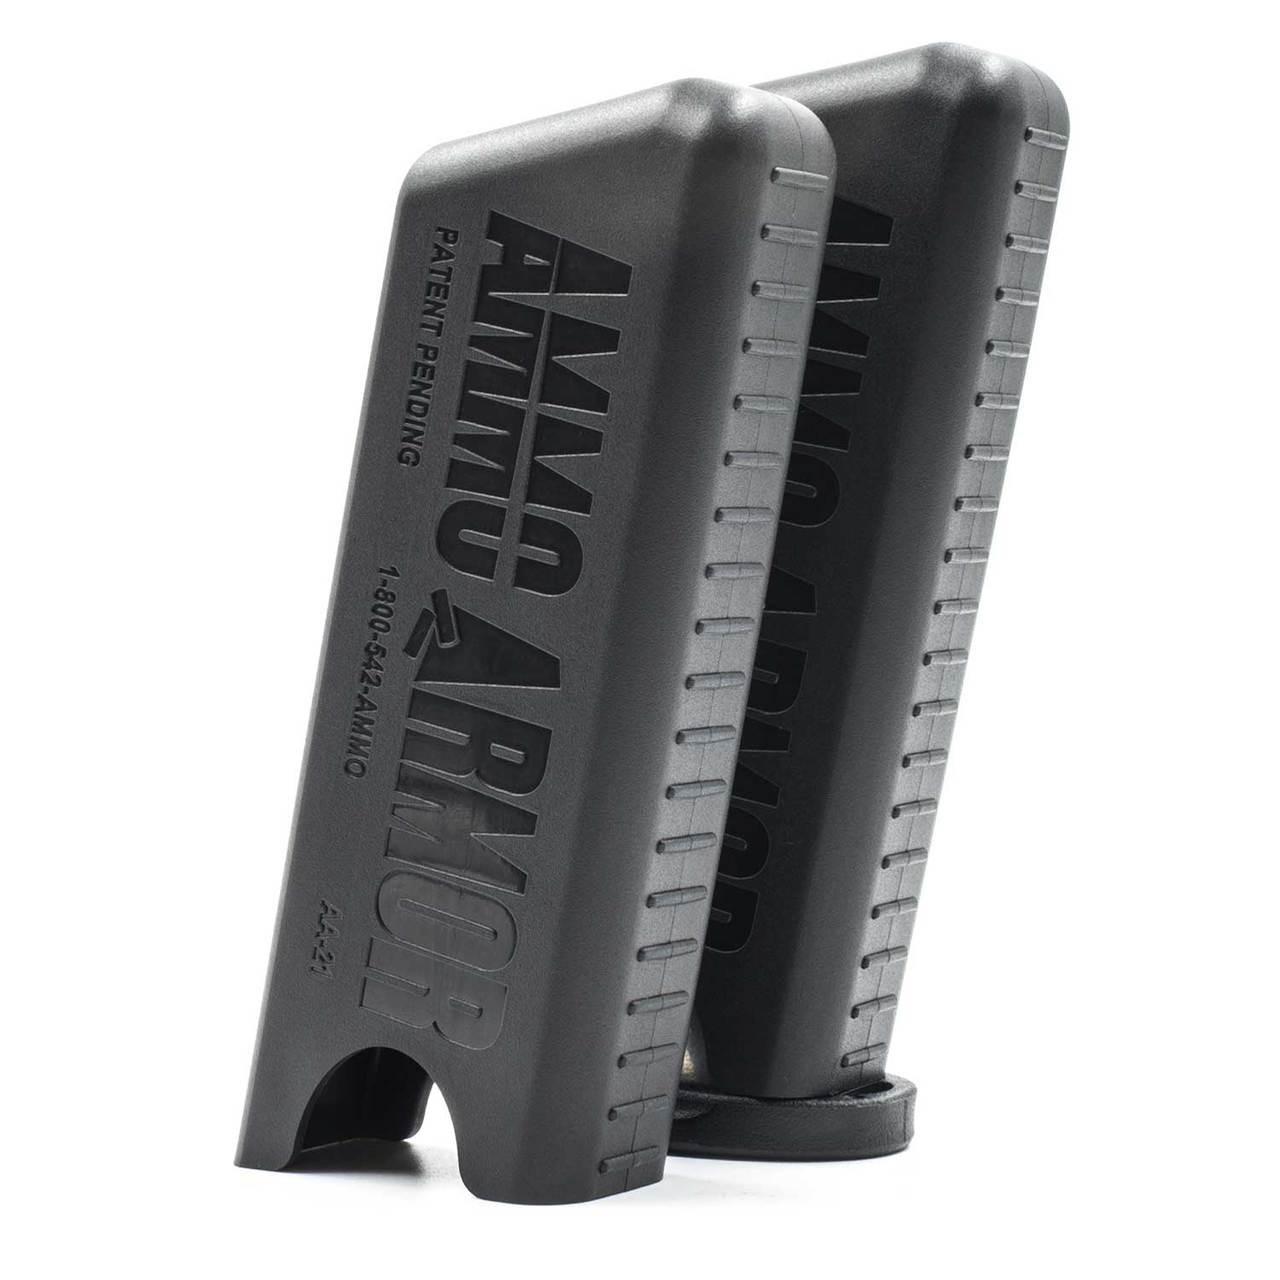 Smith & Wesson M&P Shield 45 Ammo Armor